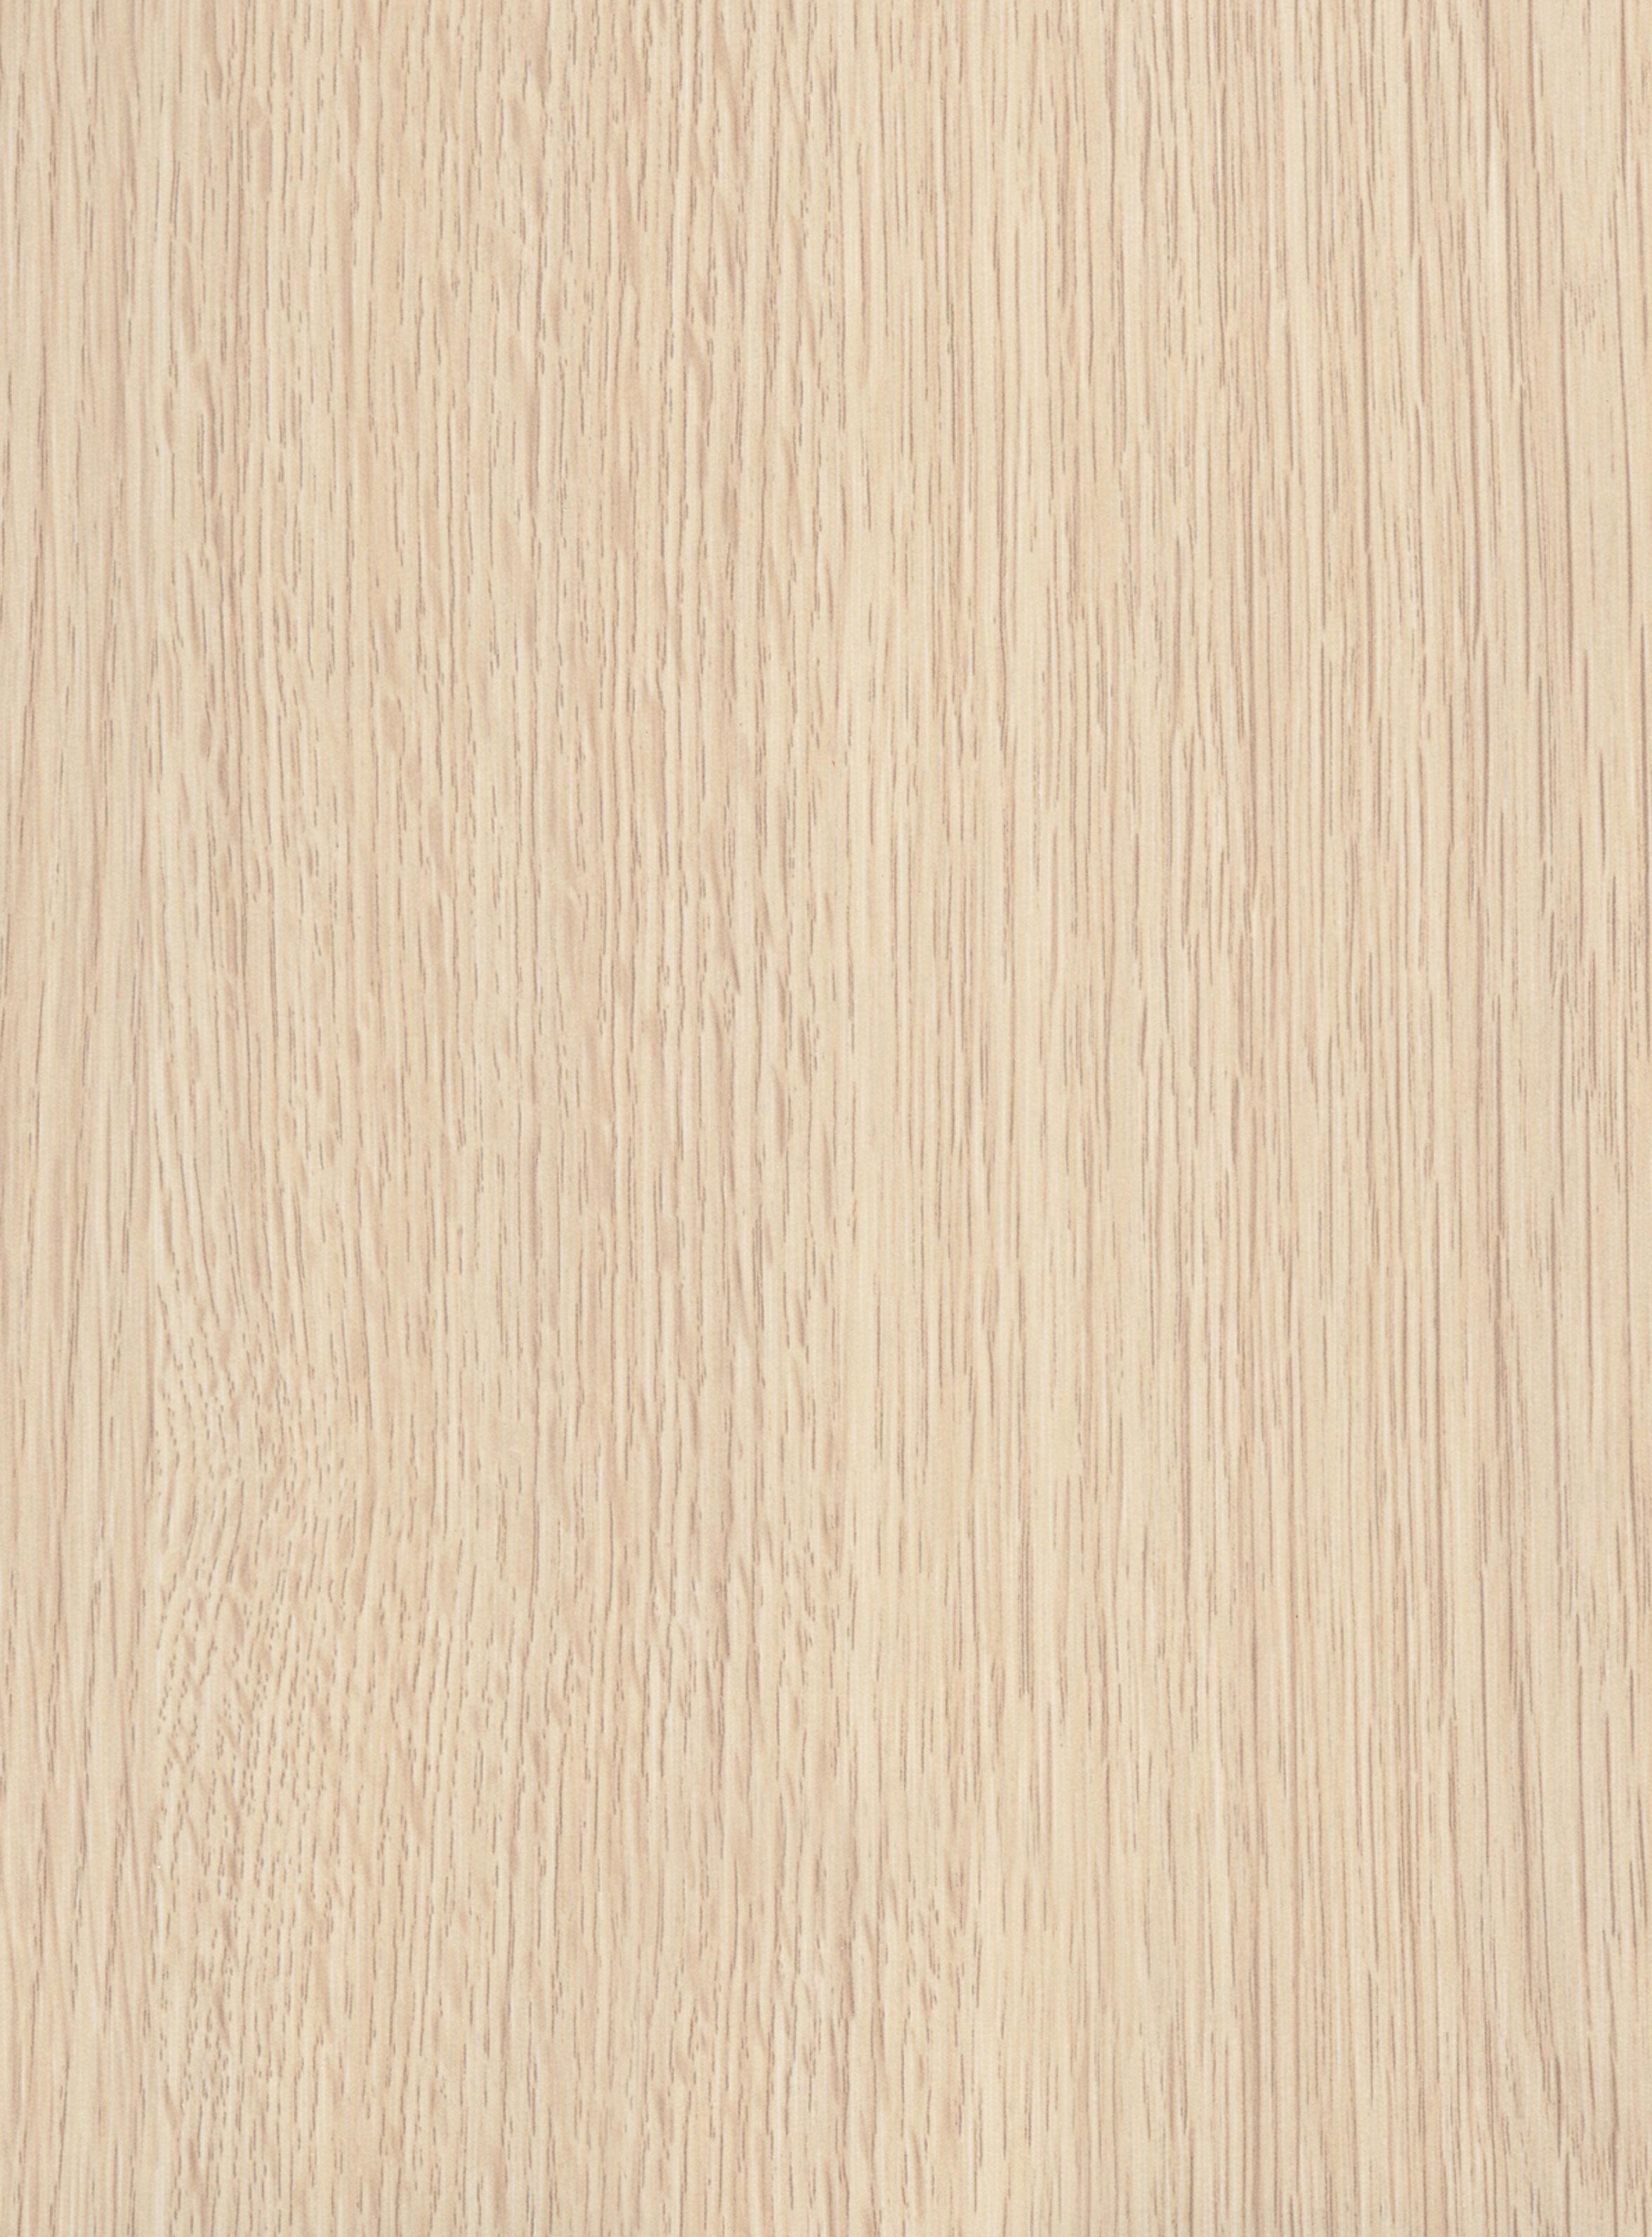 EWB 8244 S / EWK 8244 TW - Oak